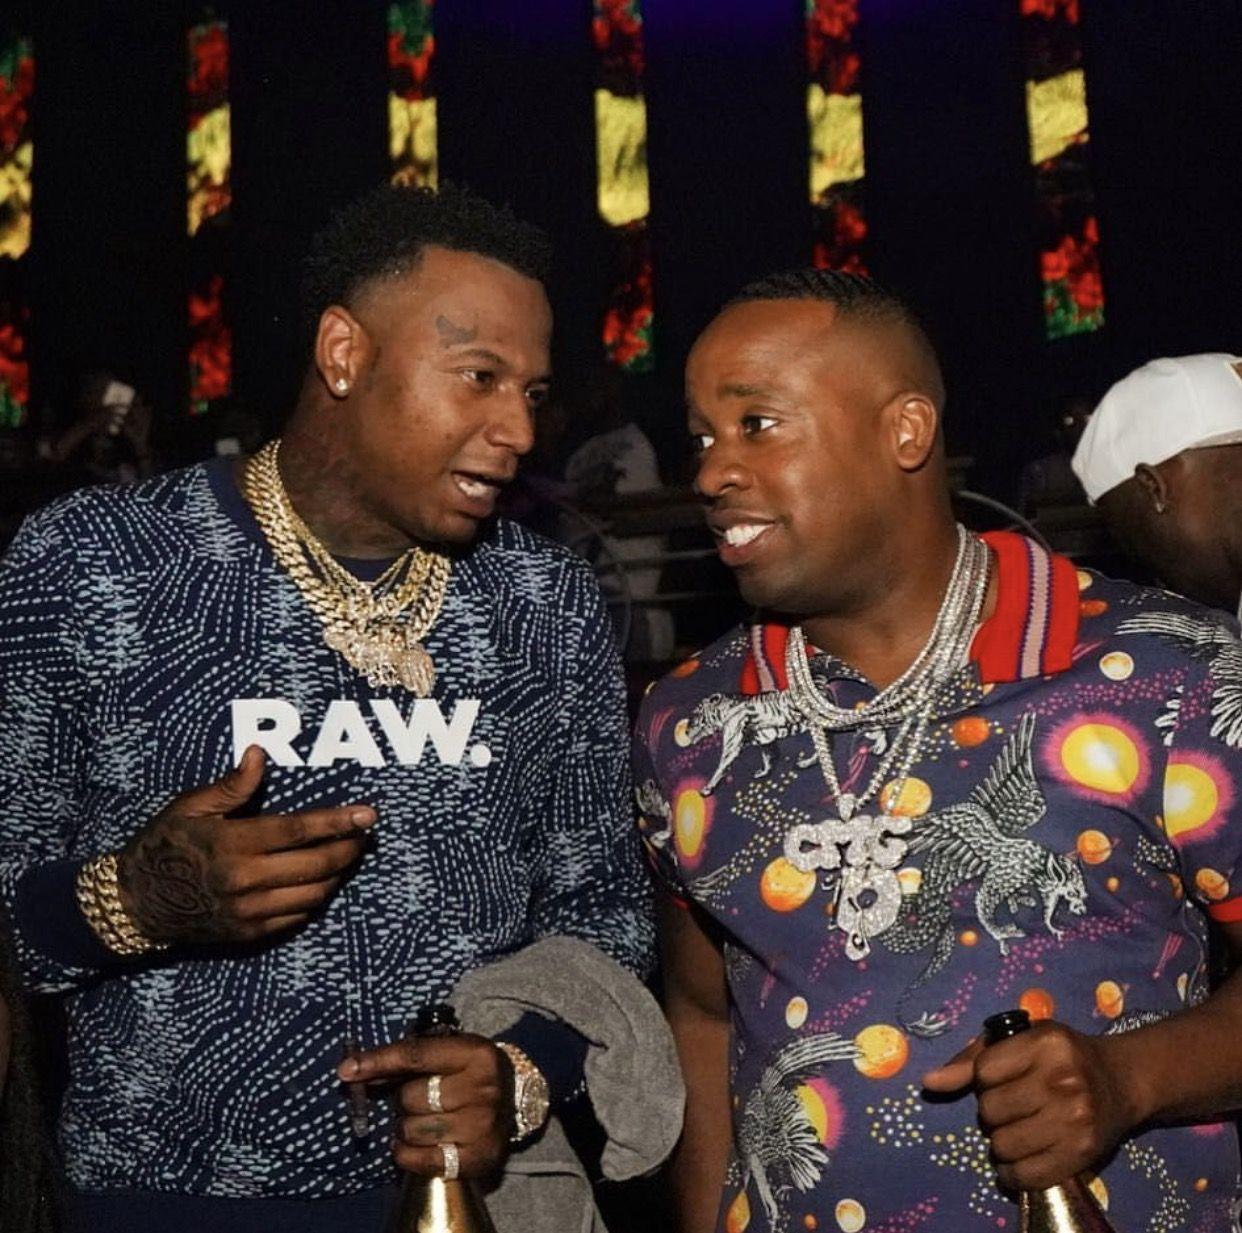 Moneybagg Yo And Yo Gotti Yo Gotti Rappers Rihanna